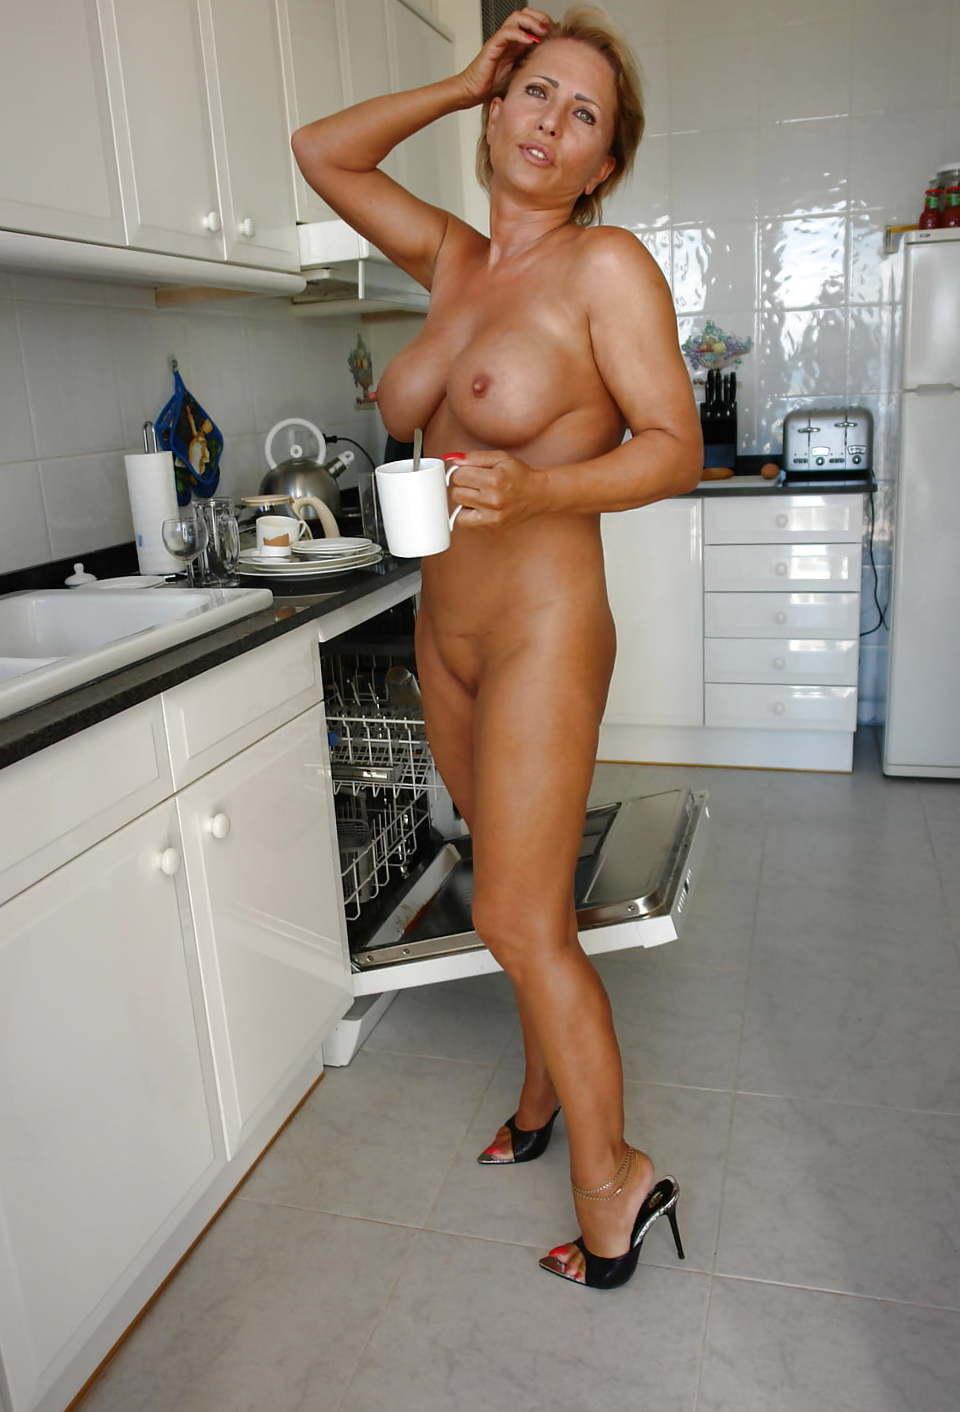 B nackt lady Lady legsworld